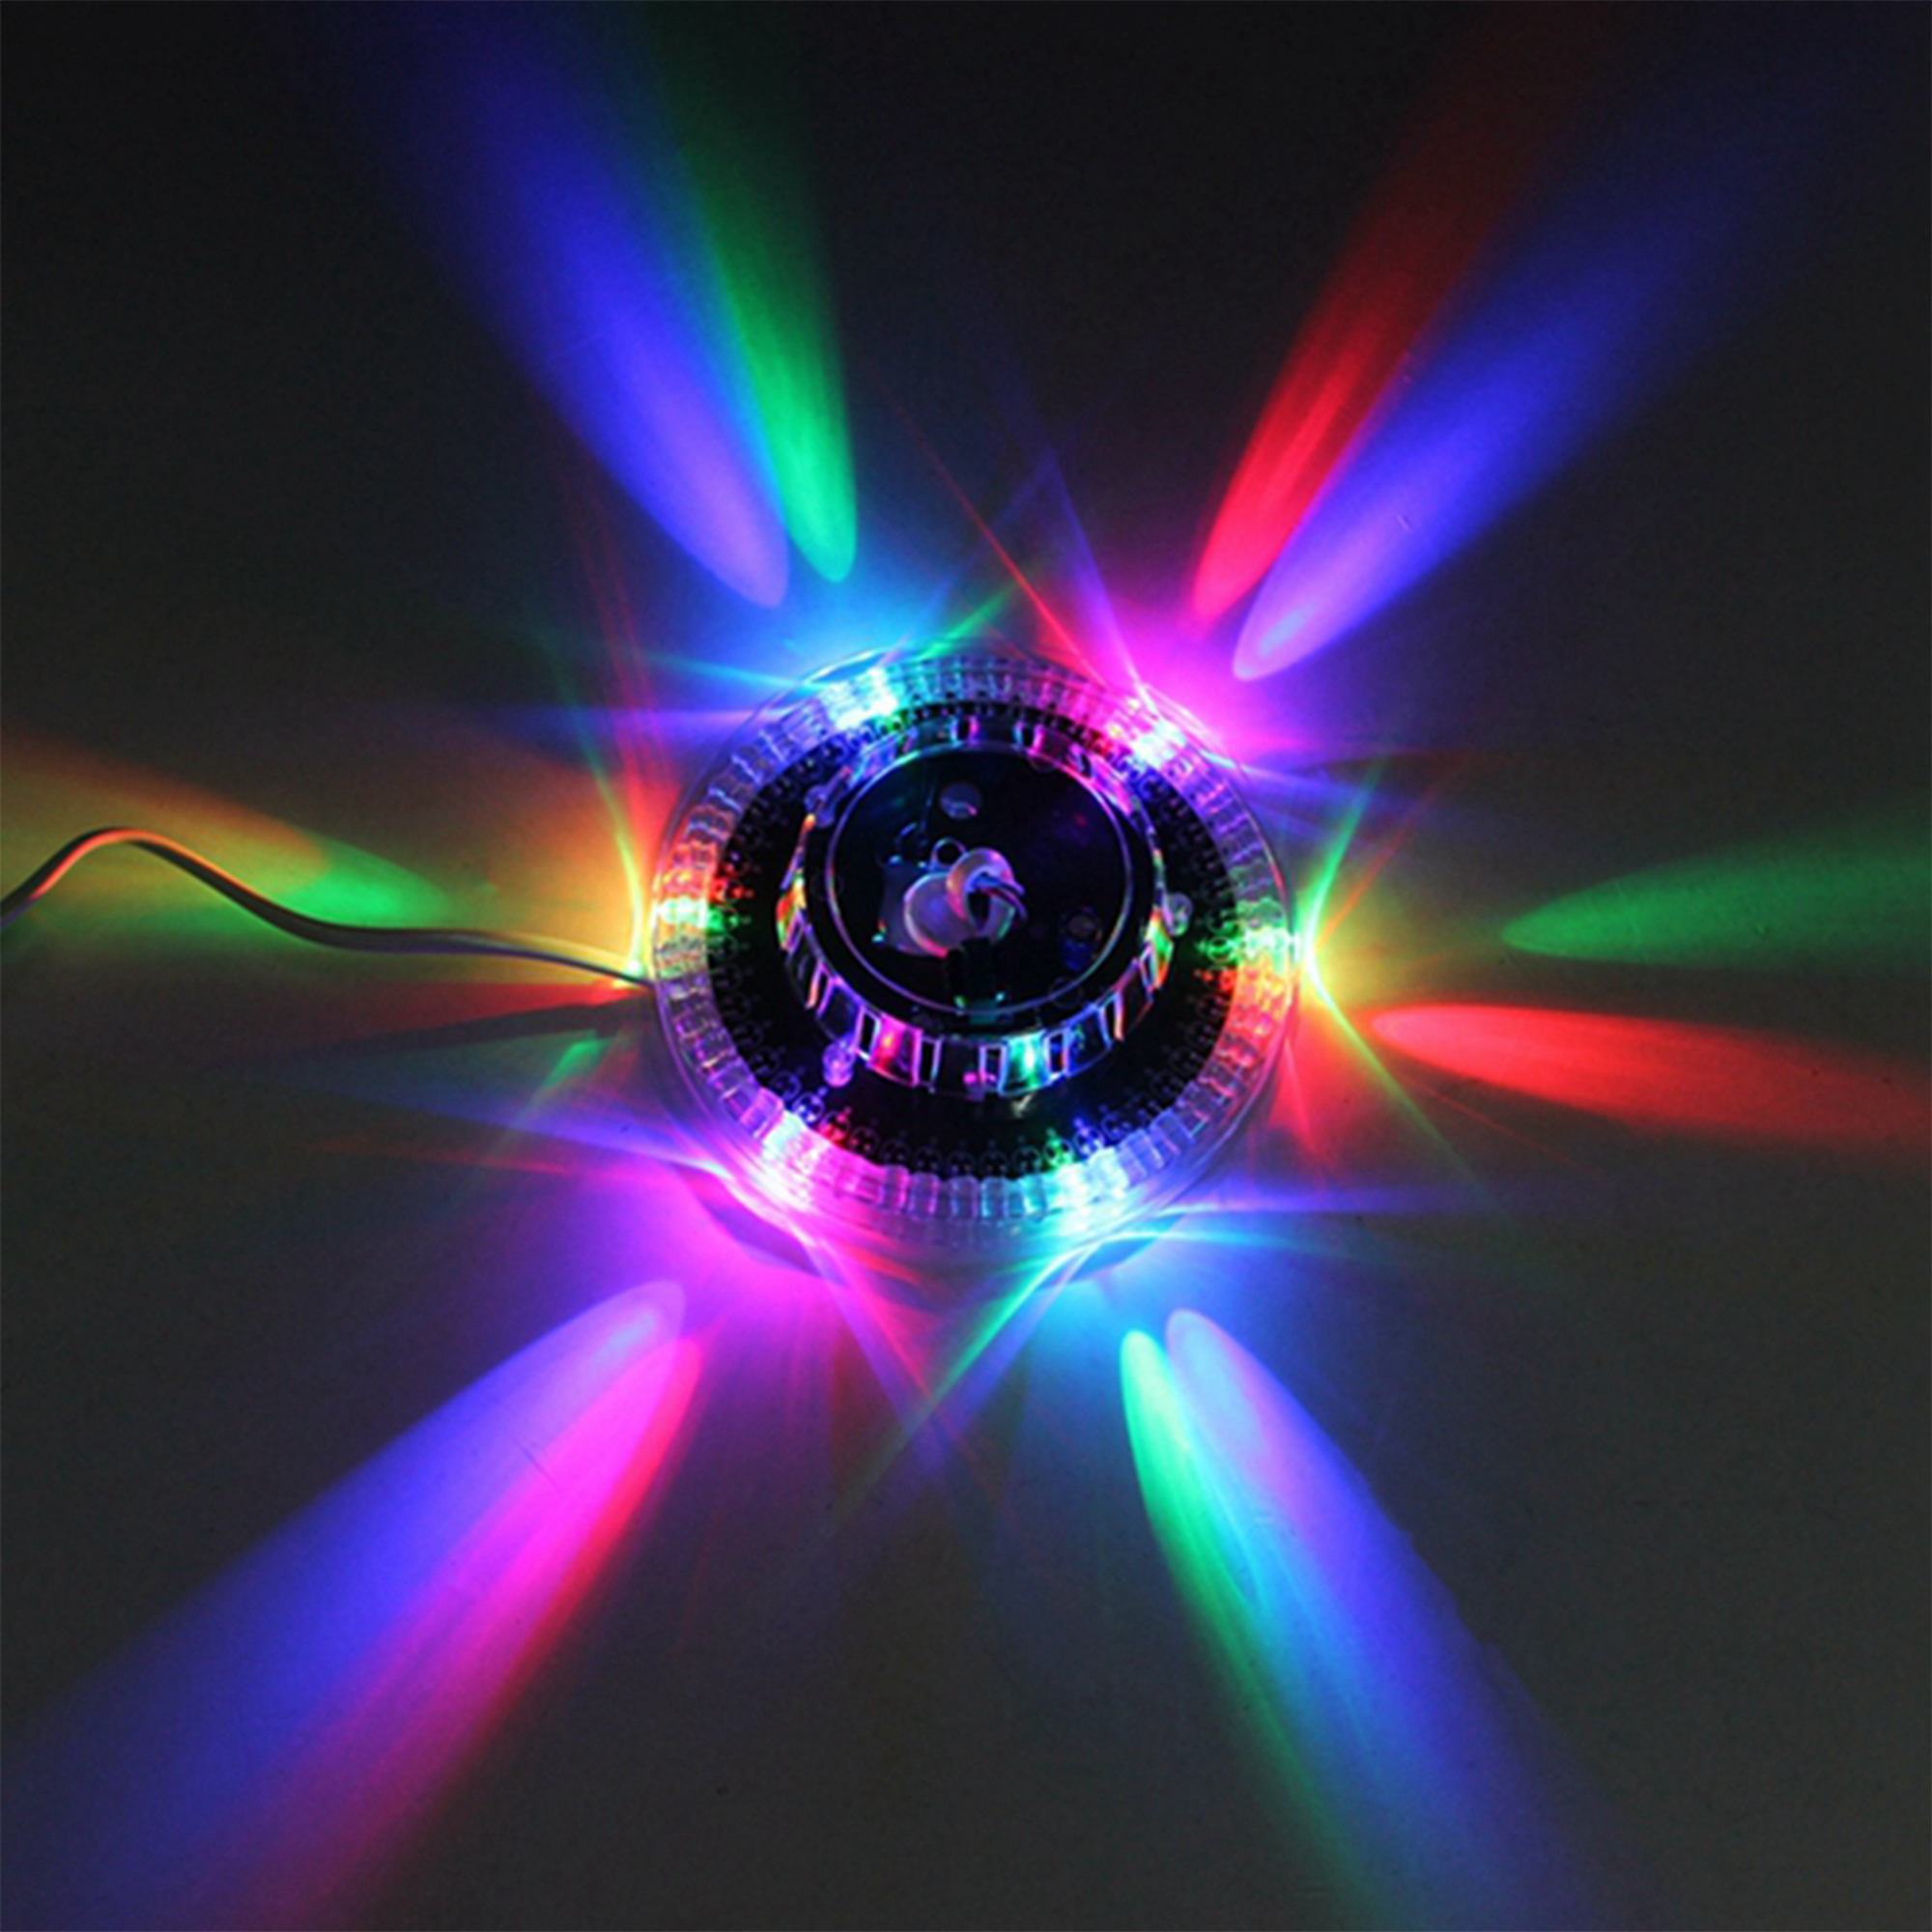 UFO Portable Laser Stage lights 8W rgb 48 leds sound activated Sunflower led lighting wall lamp for KTV DJ Wedding Christmas